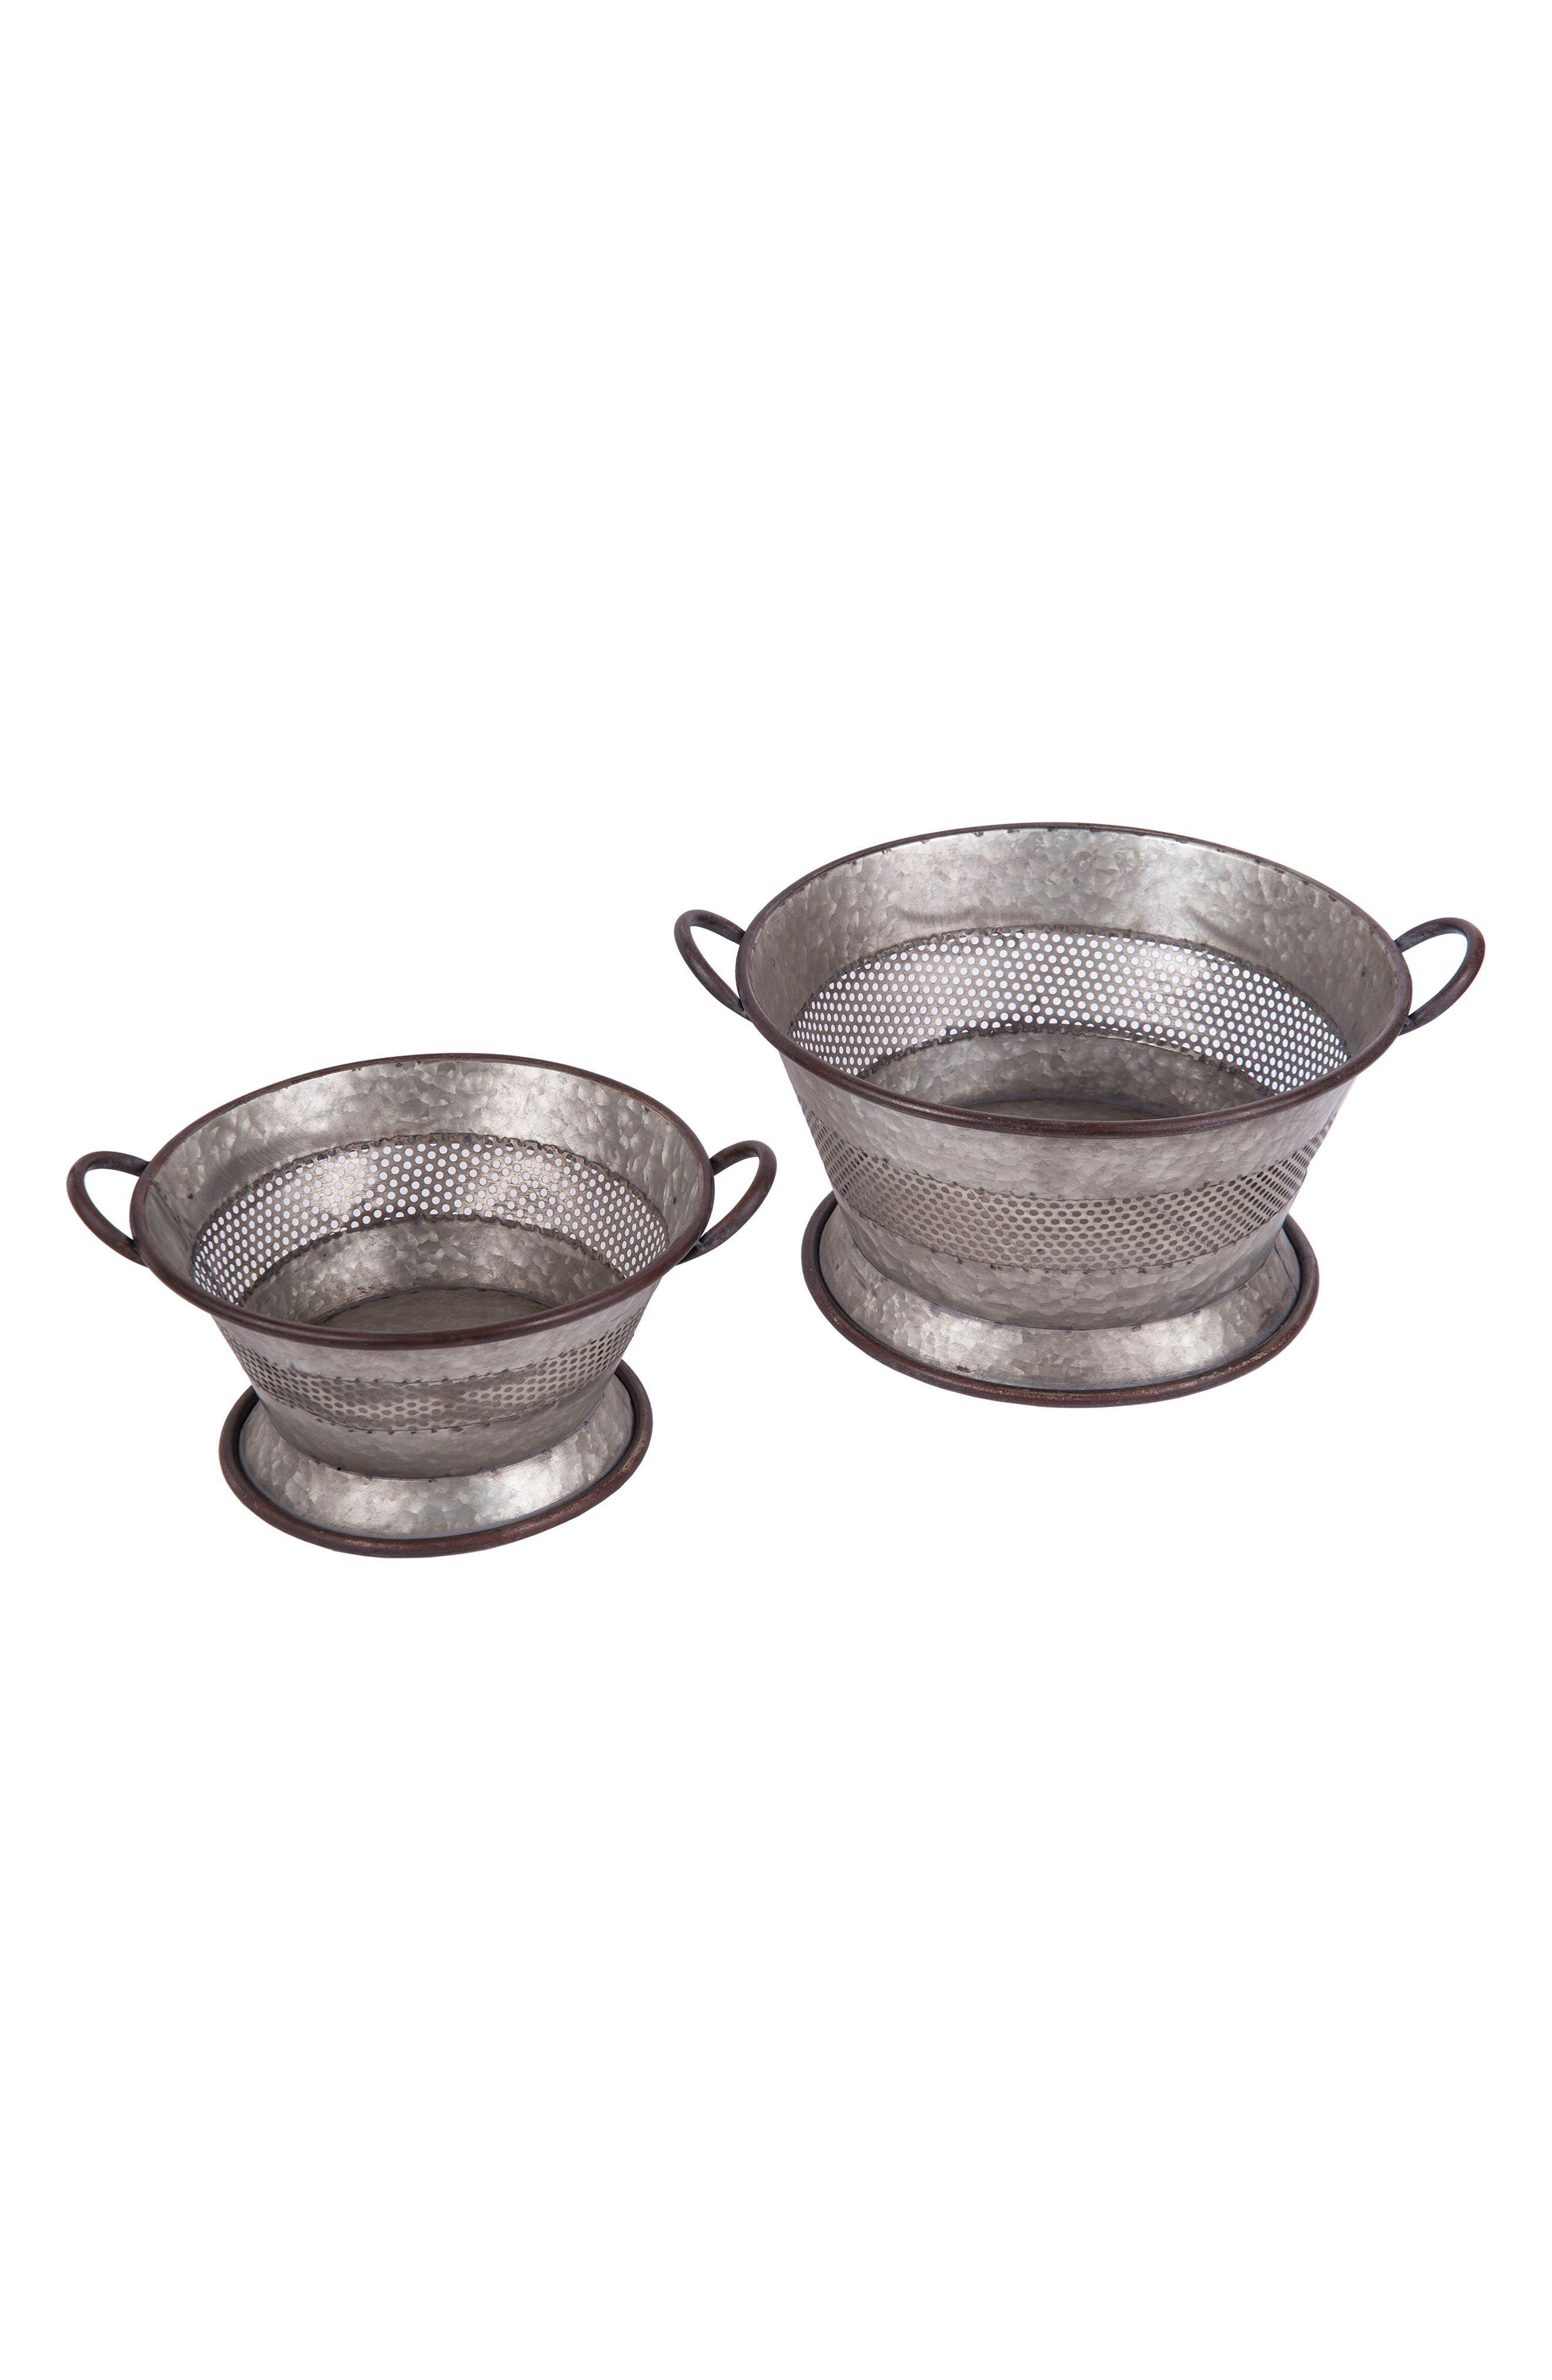 Set of 2 Decorative Strainer Baskets,                         Main,                         color, 040